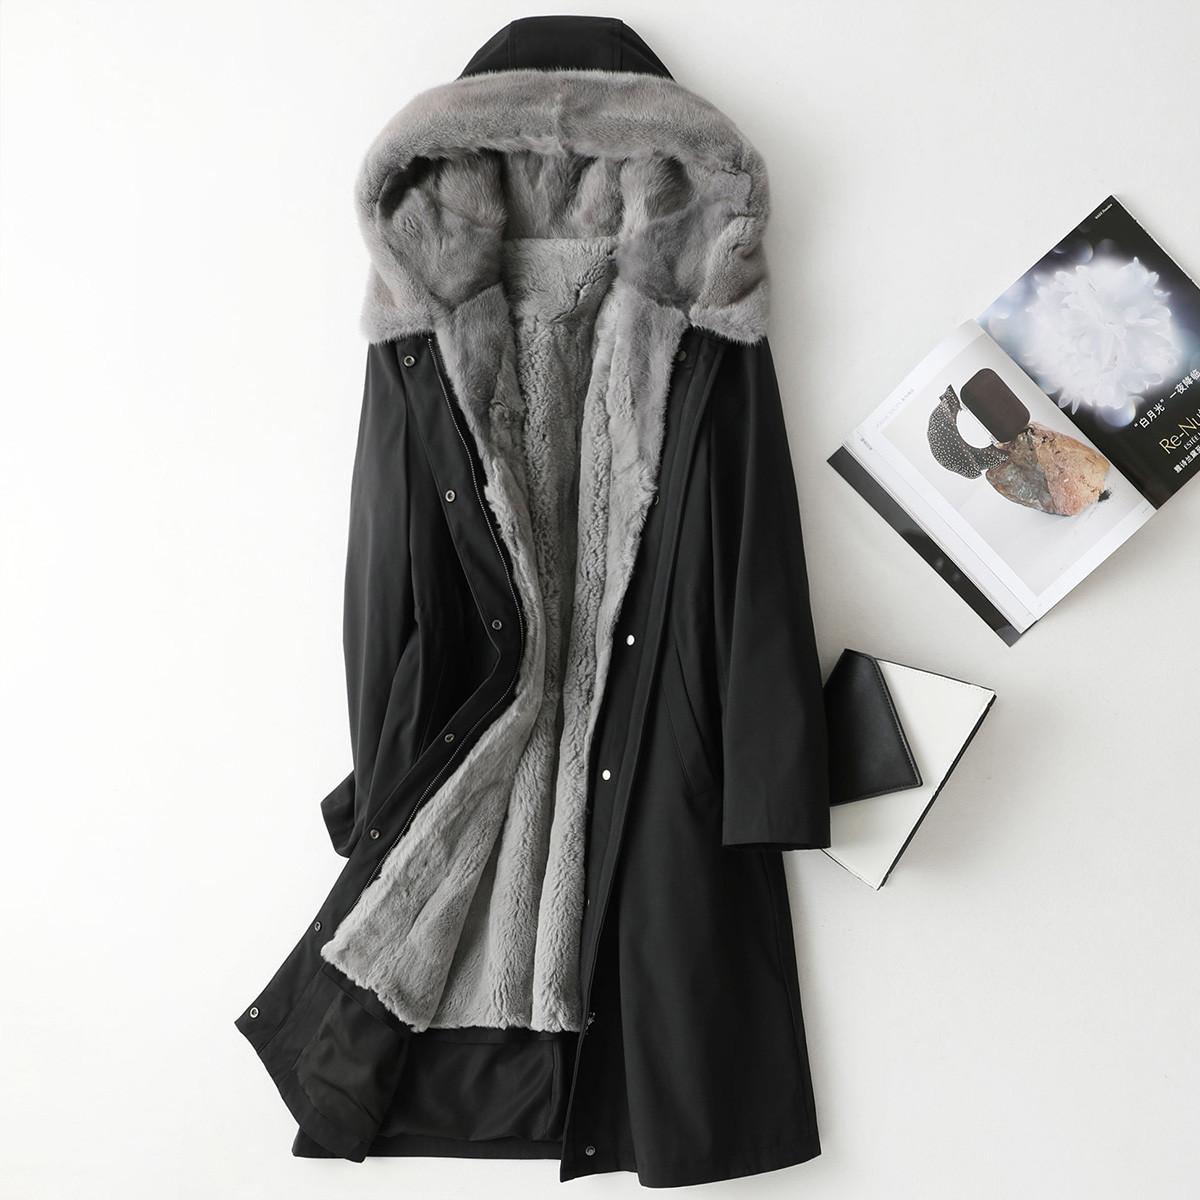 Aulenti时尚纯色长款派克服女士2019冬季新款獭兔毛内胆水貂毛领连帽大衣ALT49007HH